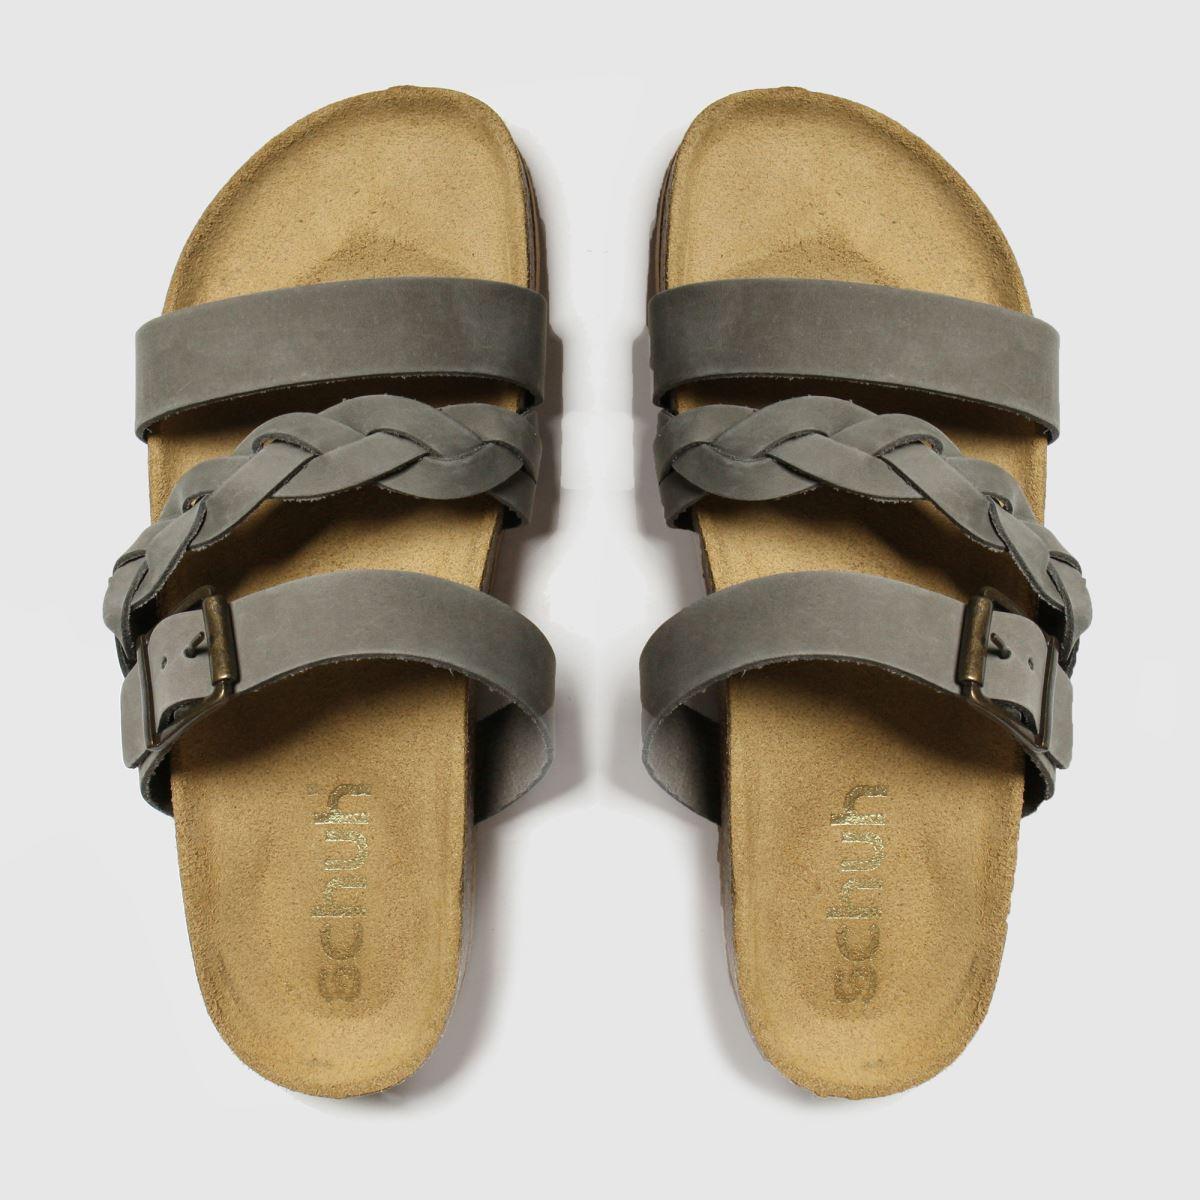 schuh Schuh Stone Mystic Sandals